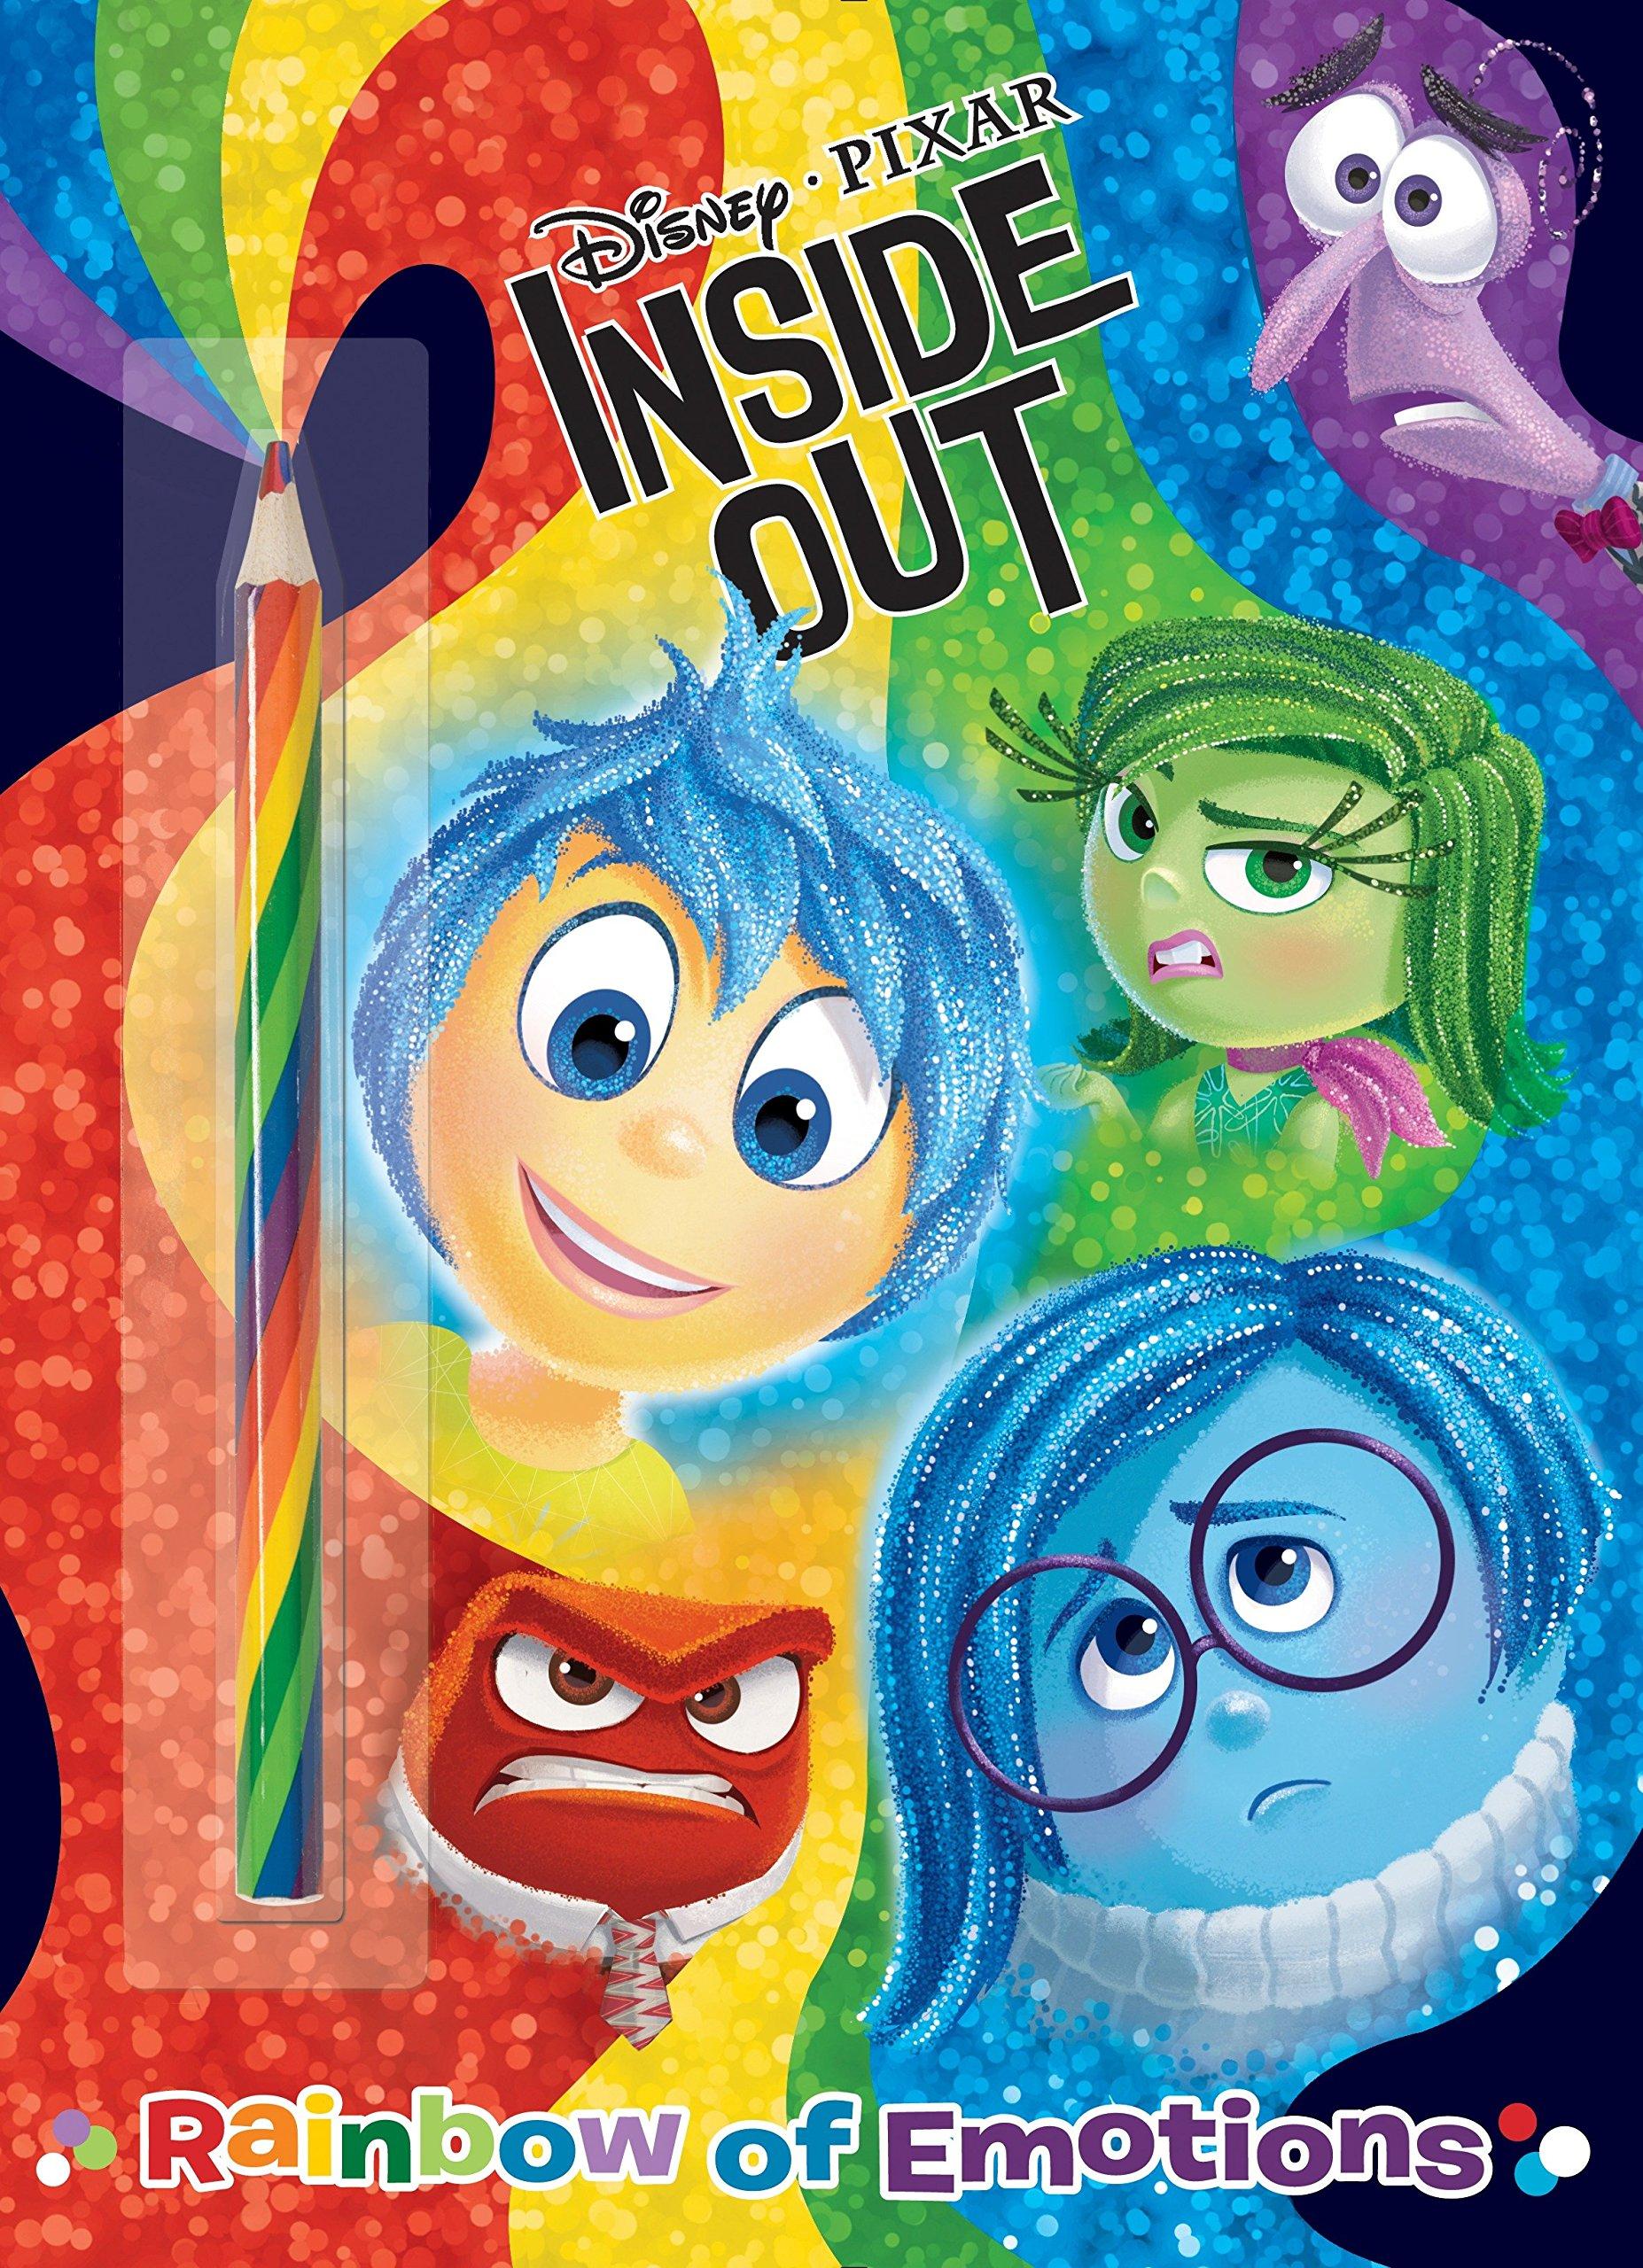 RAINBOW OF EMOTIONS: RH Disney: 9780736432870: Amazon com: Books